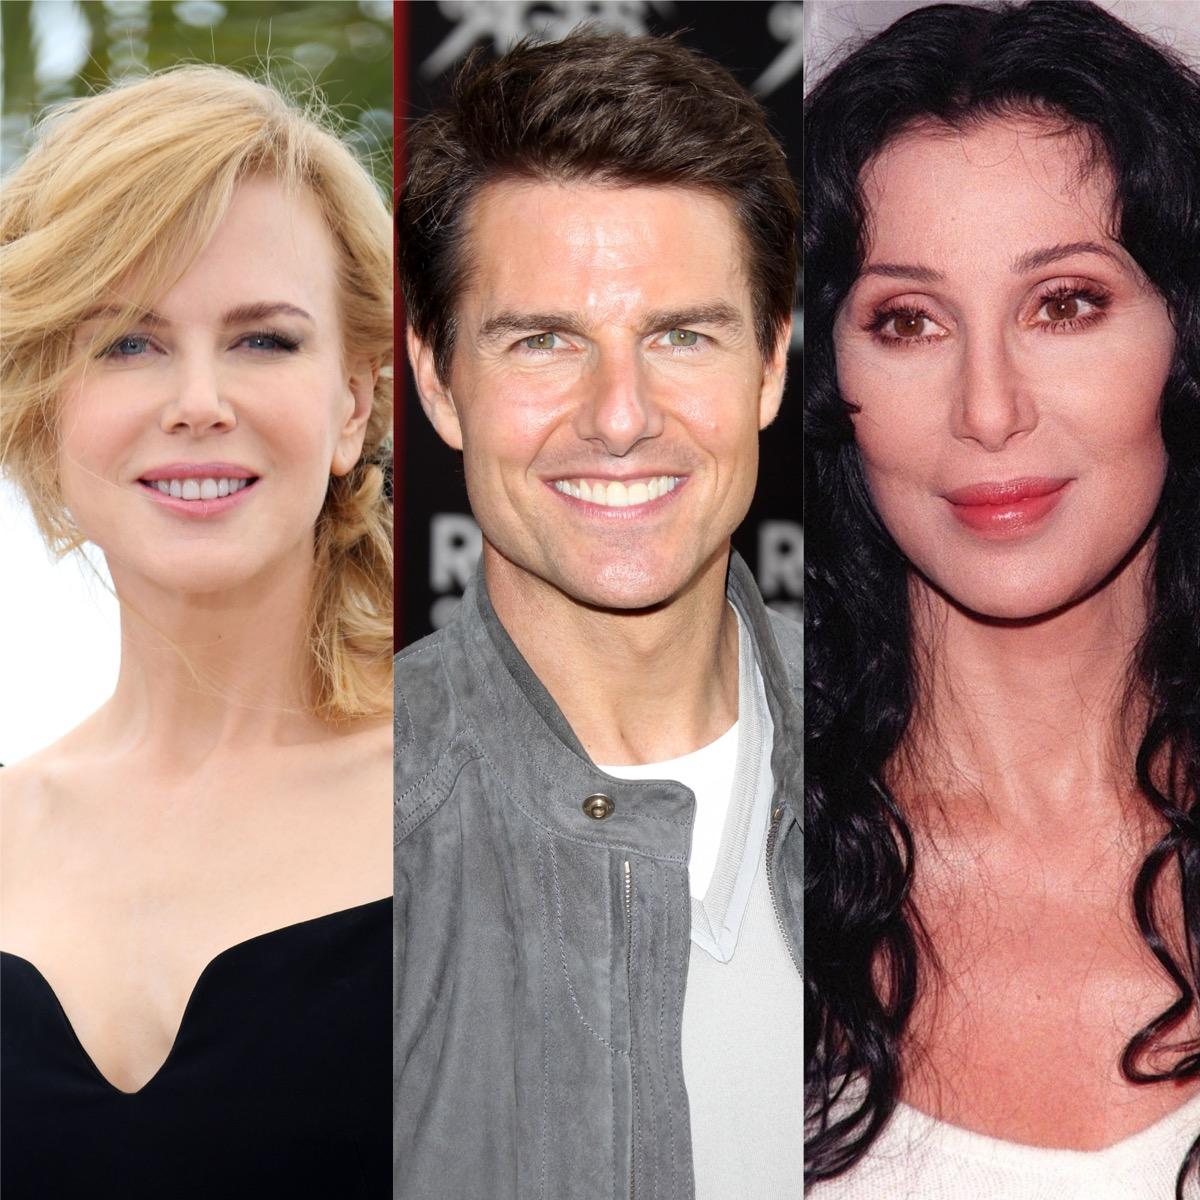 Nicole Kidman, Tom Cruise, and Cher